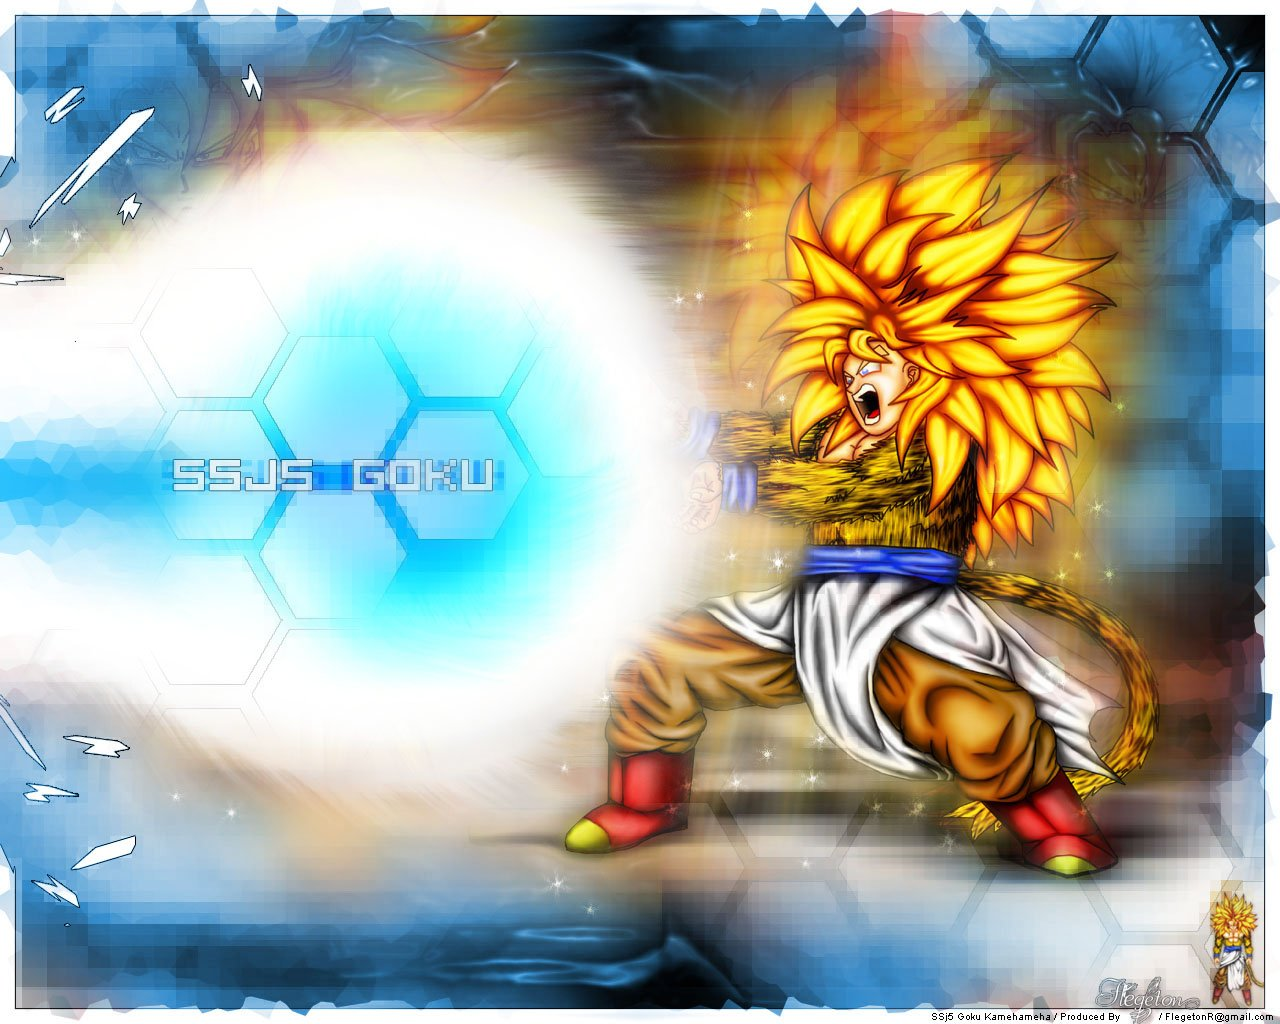 SSJ5 Goku kamehameha by Flegeton 1280x1024